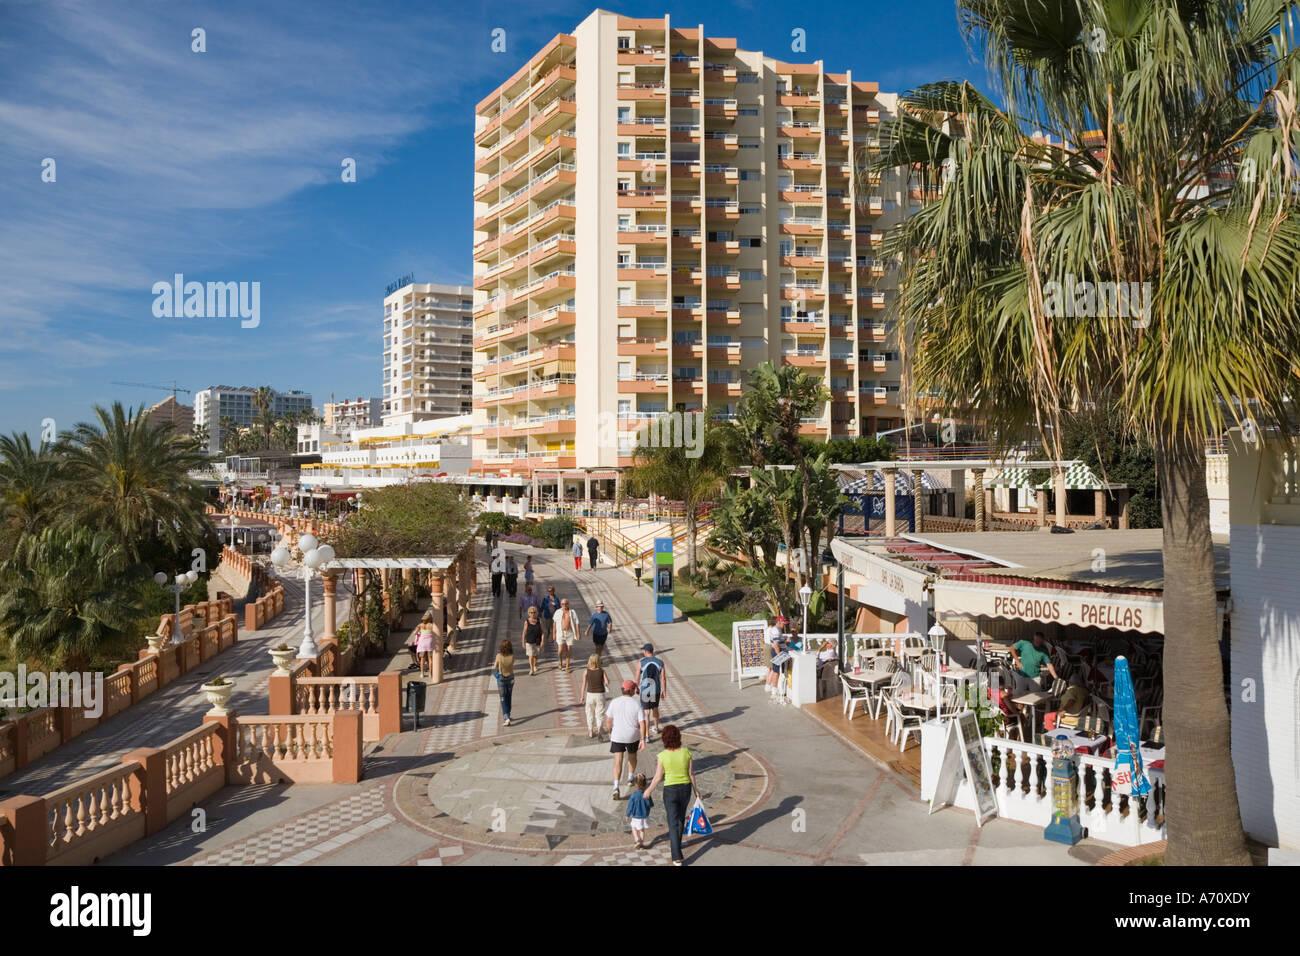 Benalmadena Costa Malaga Province Costa del Sol Spain People strolling on beach side promenade - Stock Image